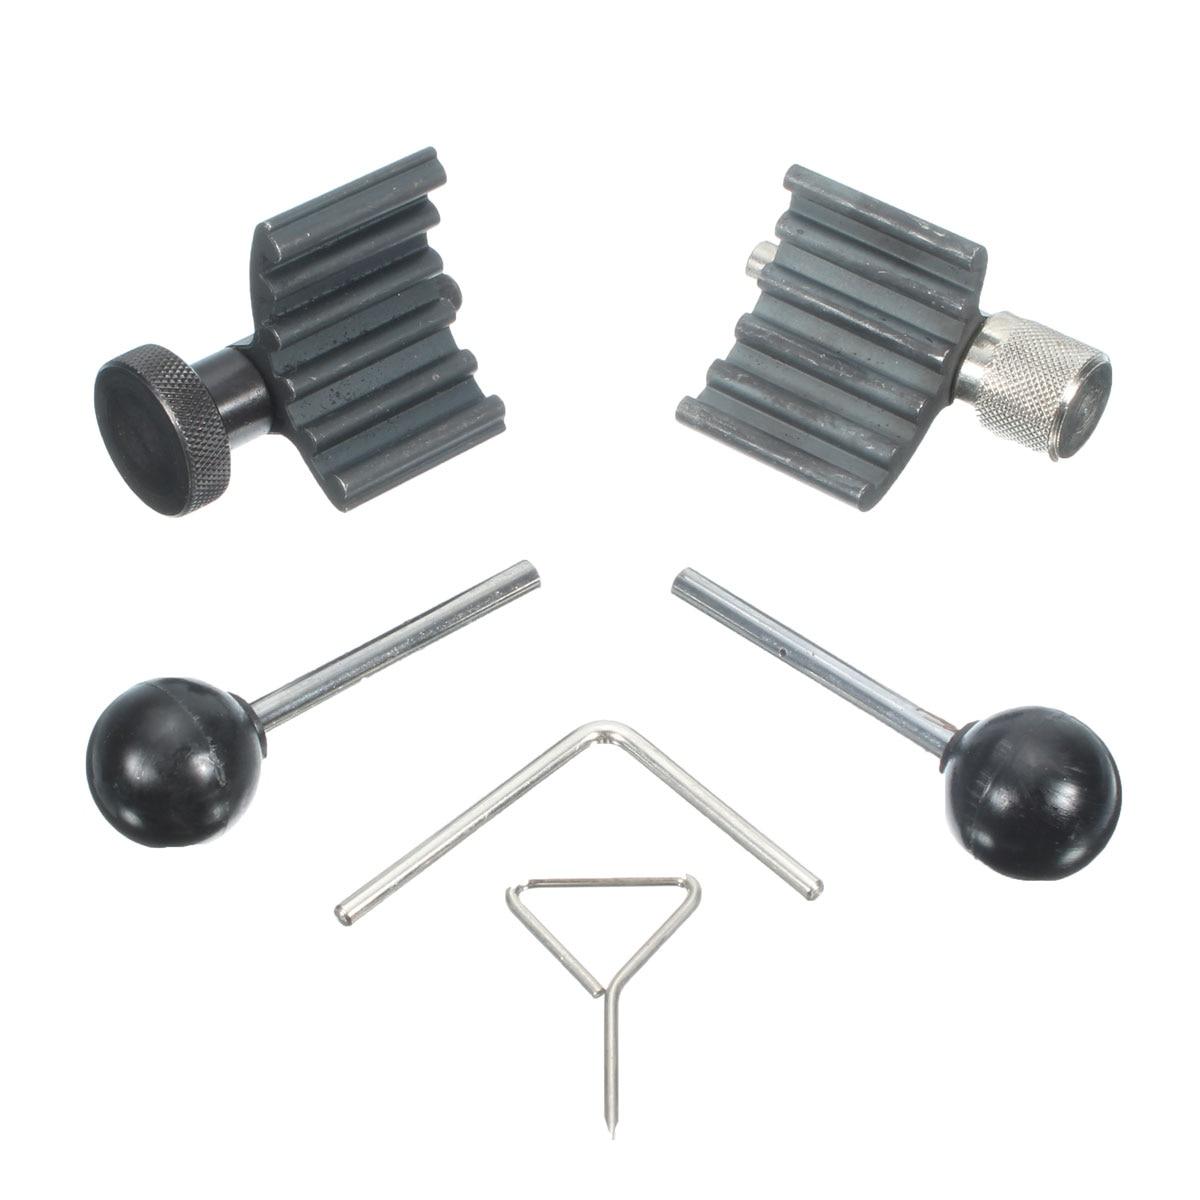 6 stücke Universal Diesel Motor Timing Cam Crank Locking Tool Set Für VW Für AUDI T10050 T10100 1,2, 1,4, 1,9, 2.0TDI